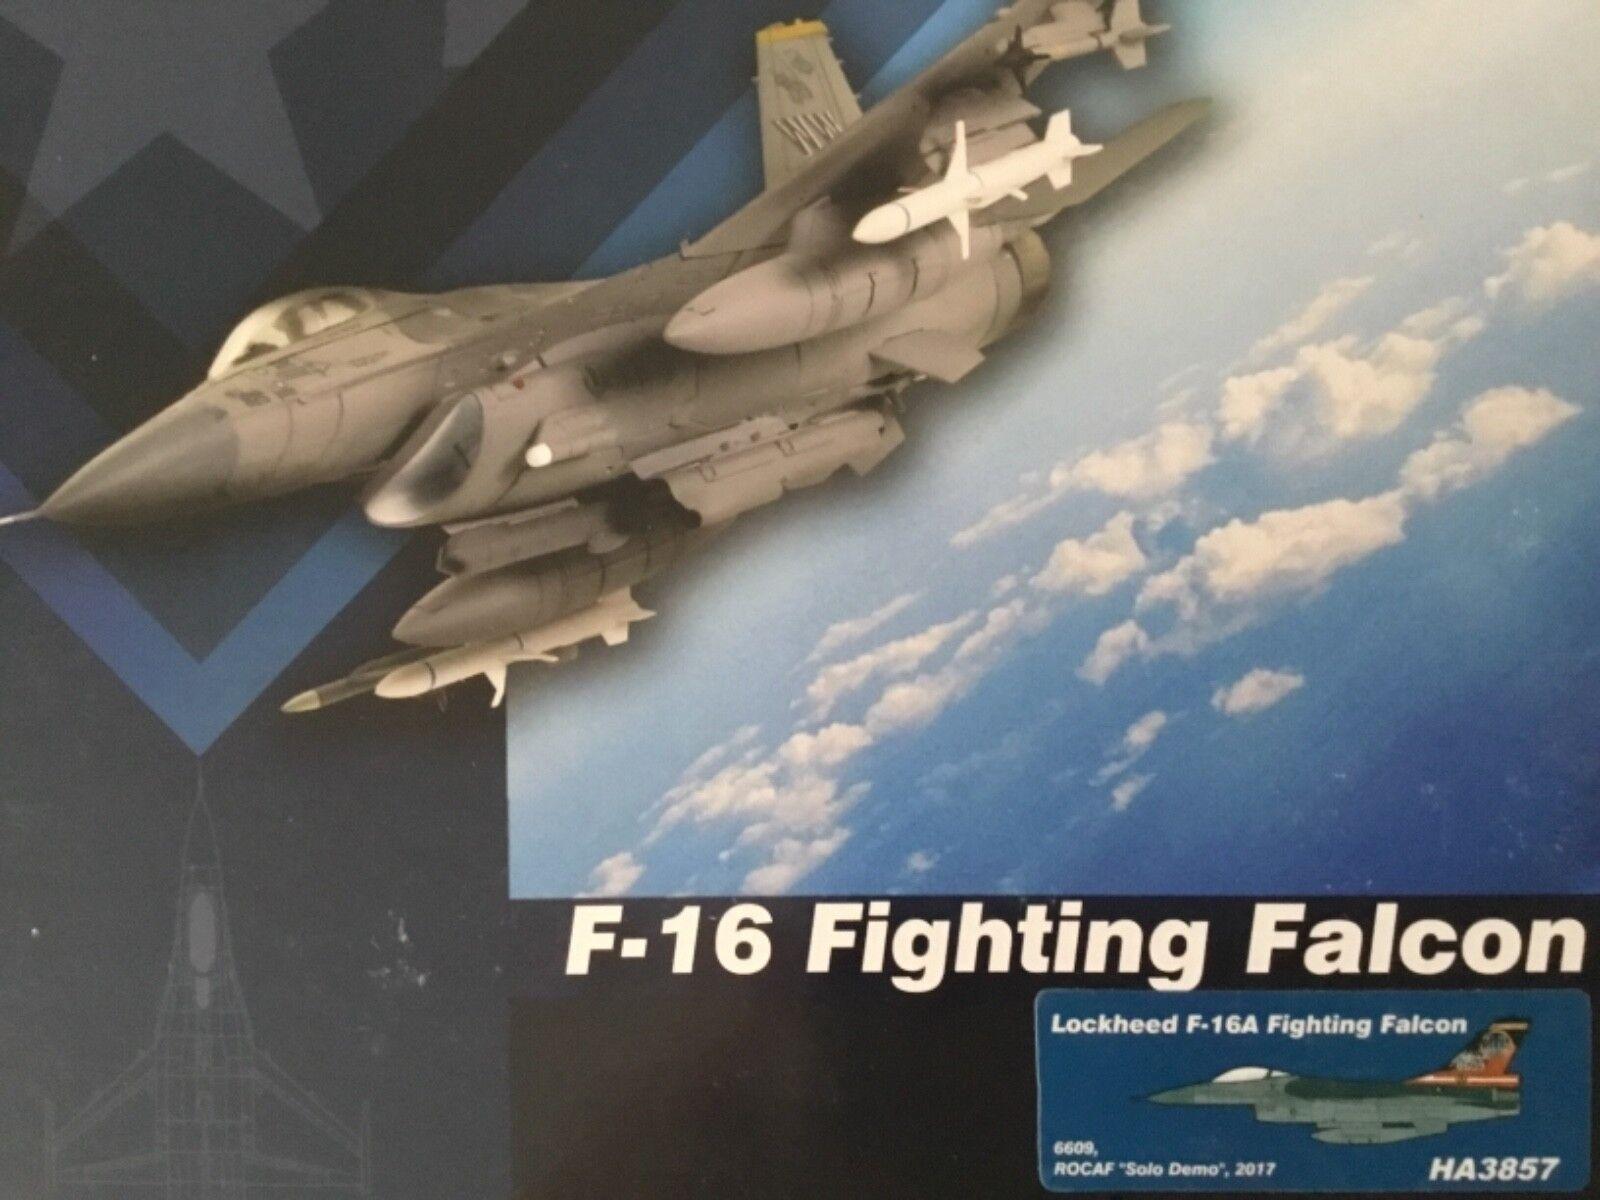 Hobby Master 1:72 HA3857 F-16 Fighting Falcon ROCAF solo Demo